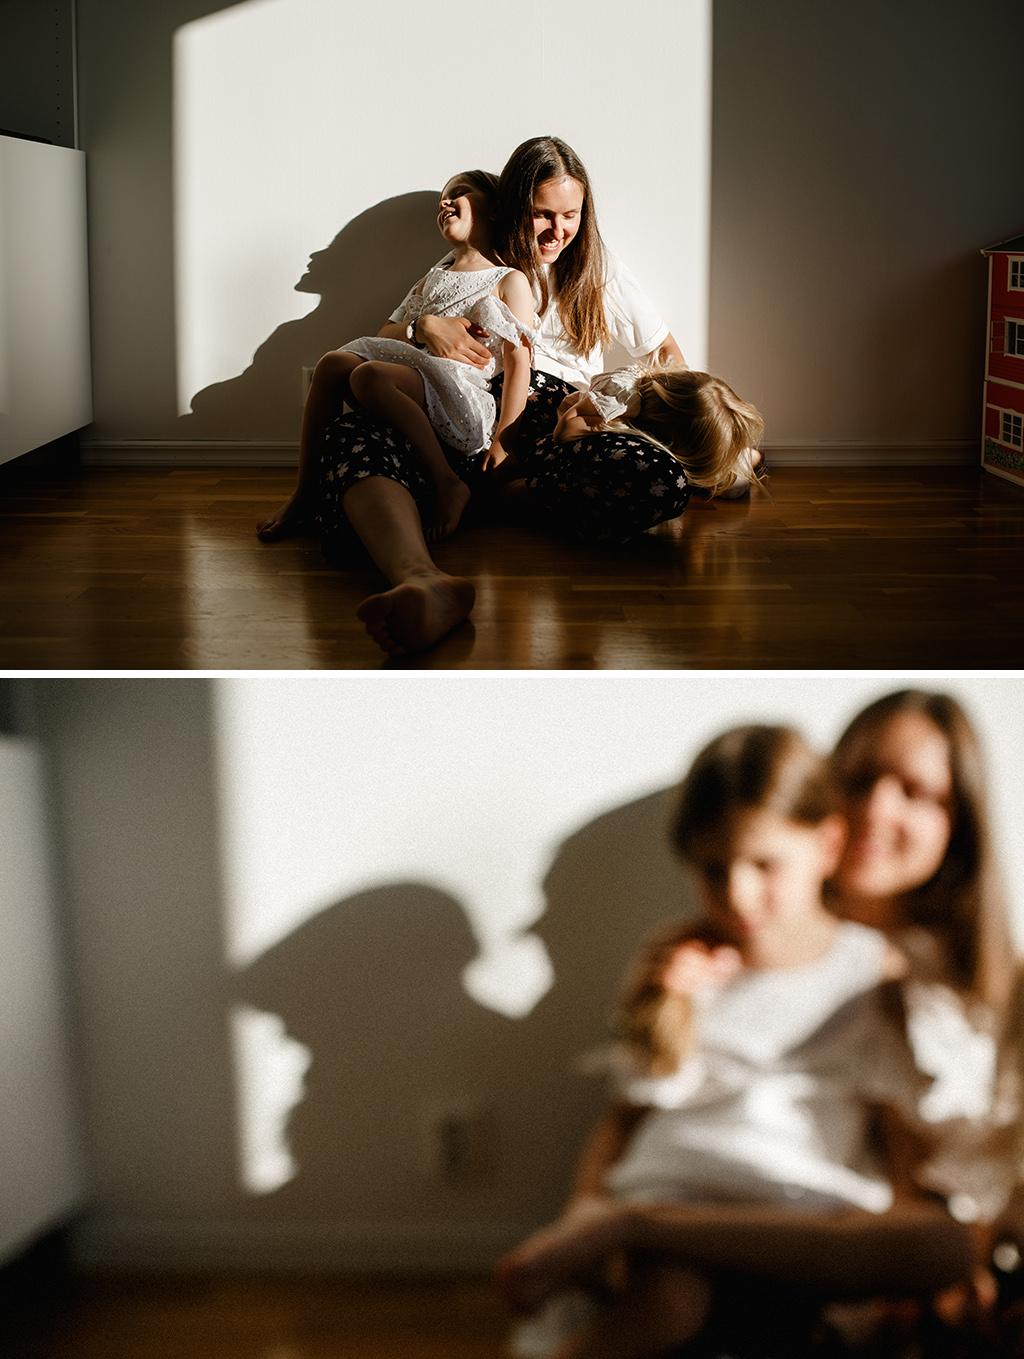 Lifestyle_hemma-hos-fotografering_Familjefotograf_Stockholm_3.jpg